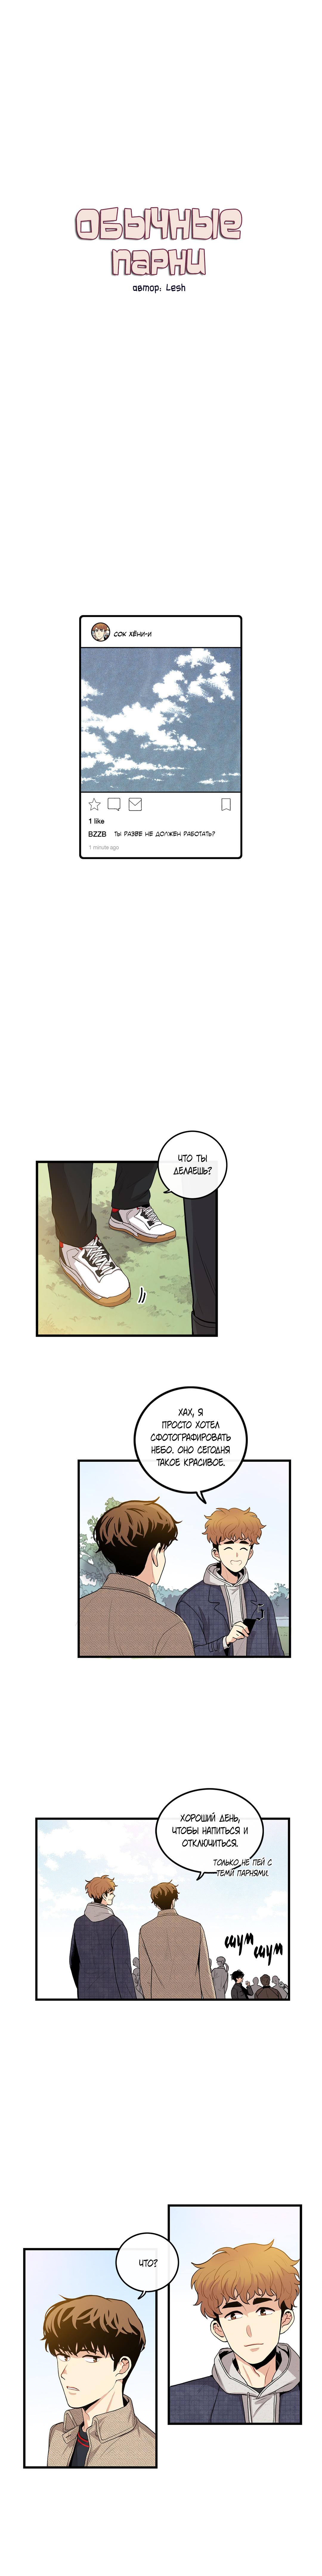 https://r2.ninemanga.com/comics/pic3/57/32441/1282426/1543424186330.jpg Page 2